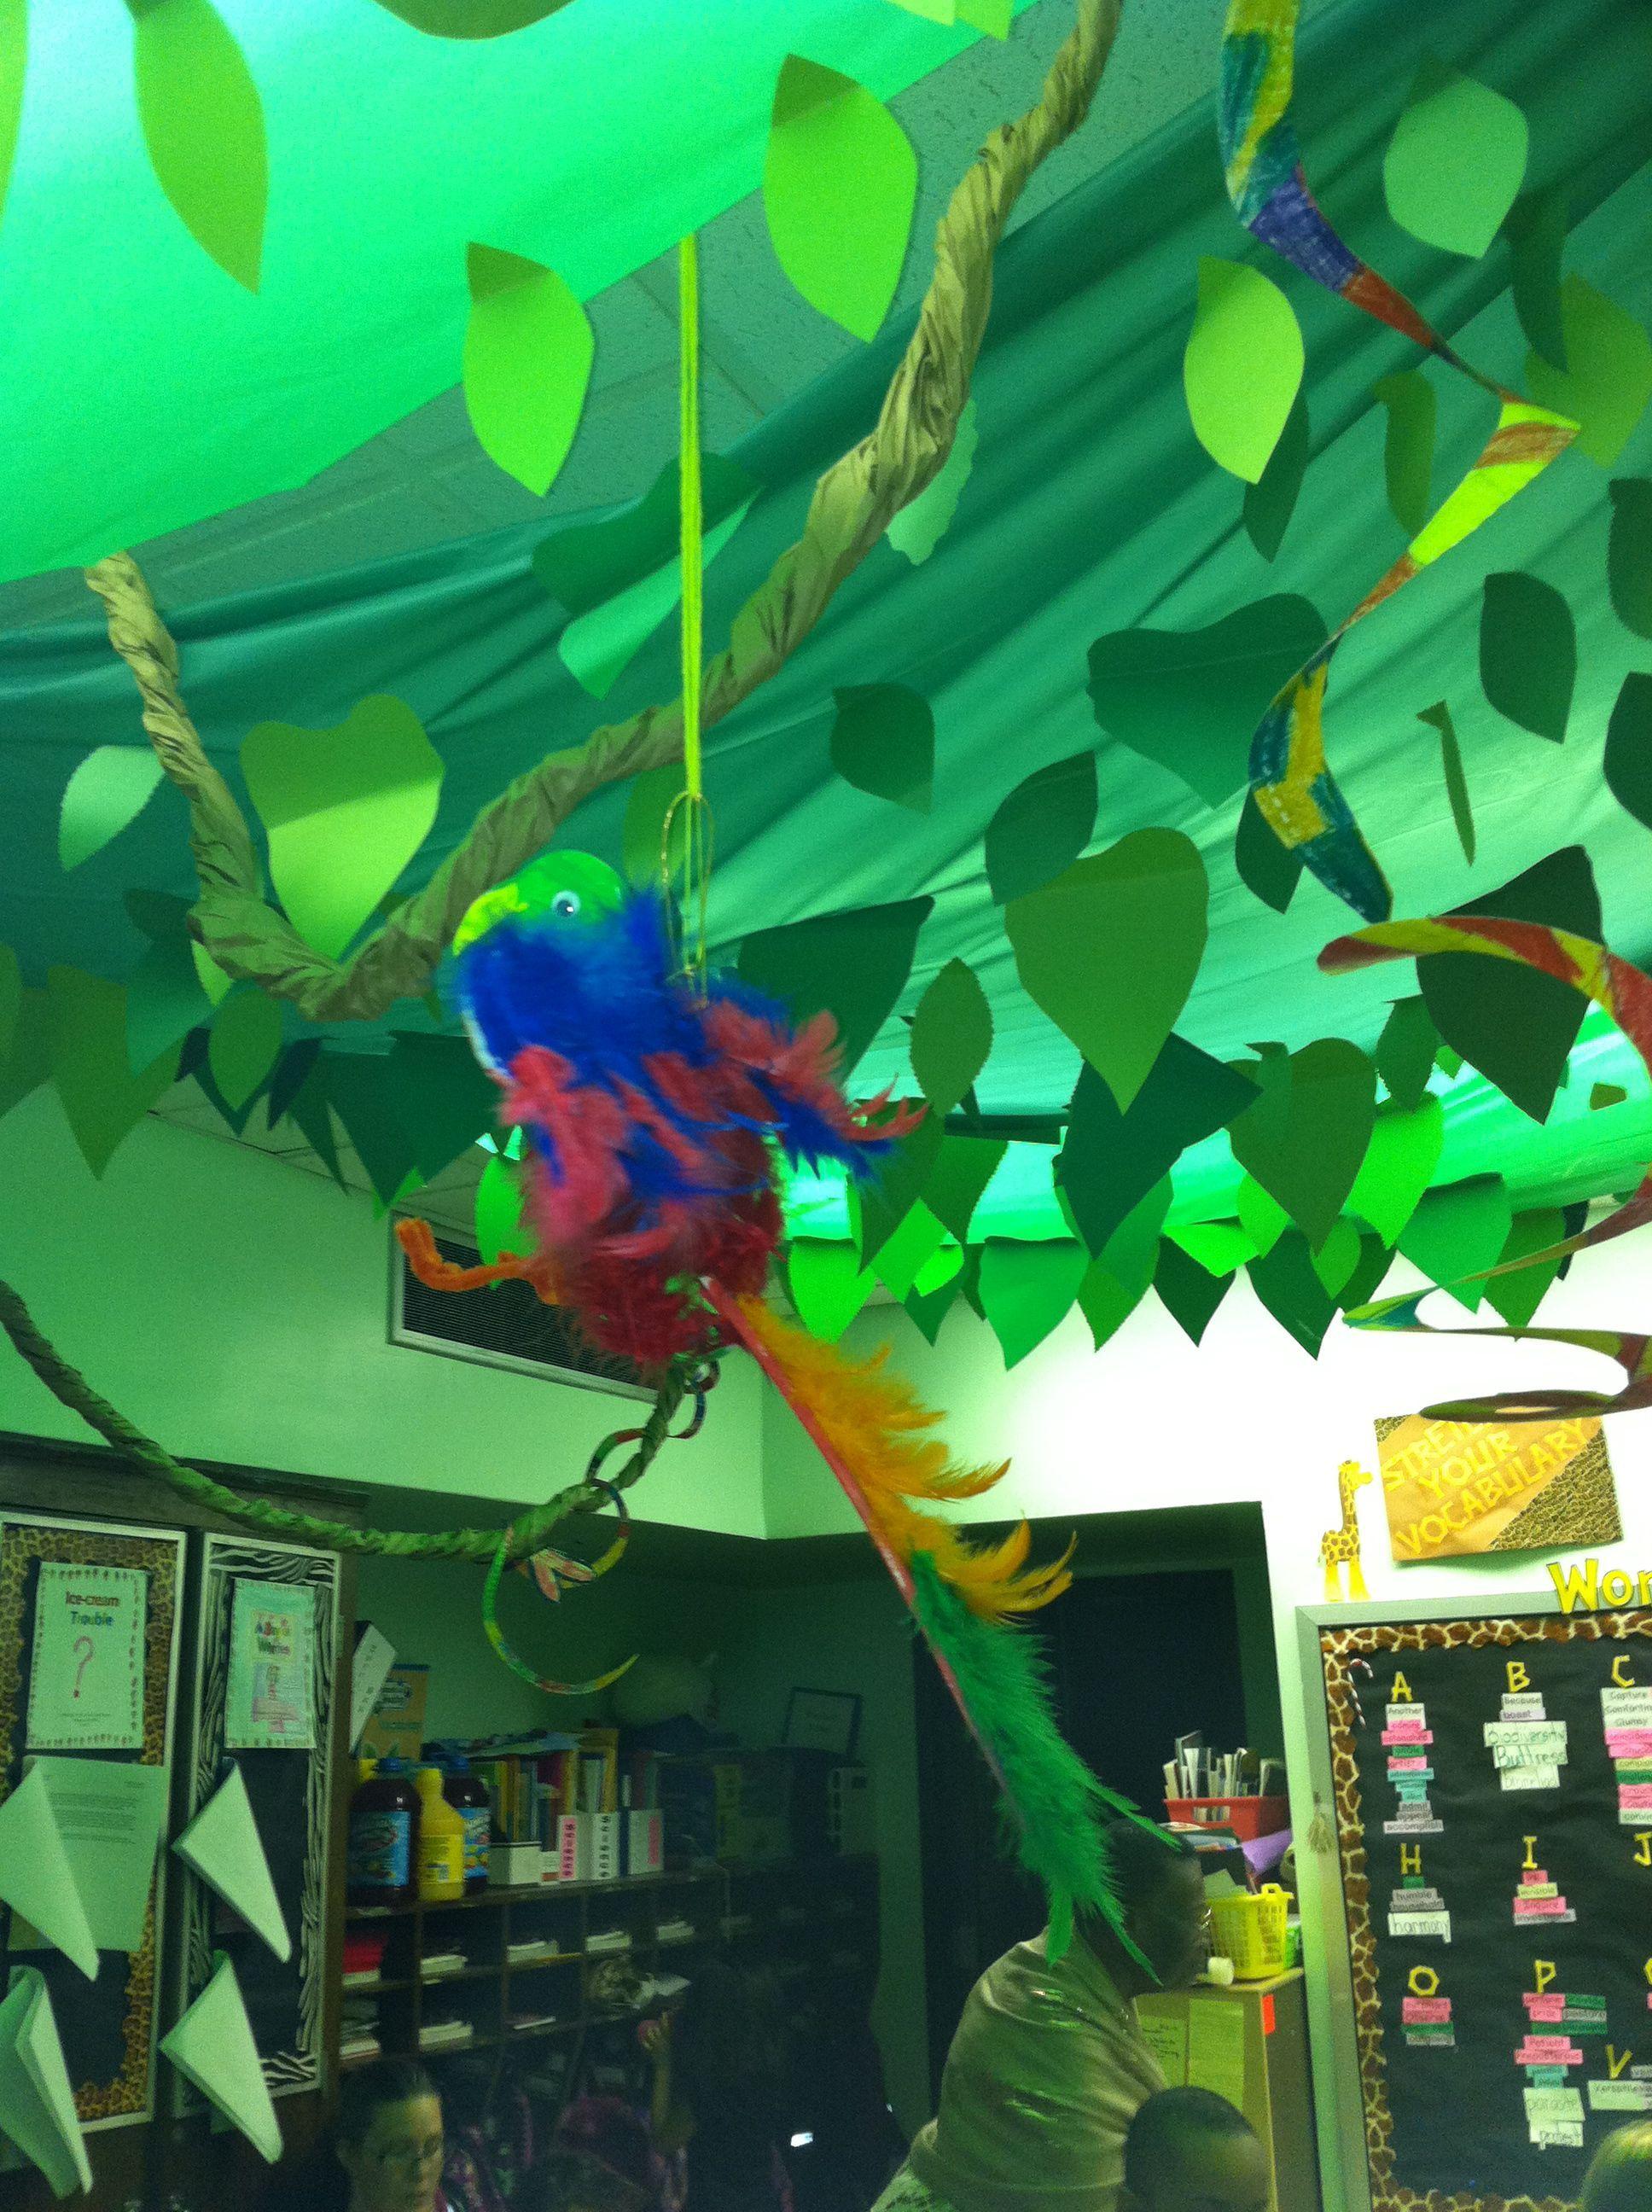 Jungle Theme Decorations Cute Classroom Inspiration Cristina Celzo From Bronx New York